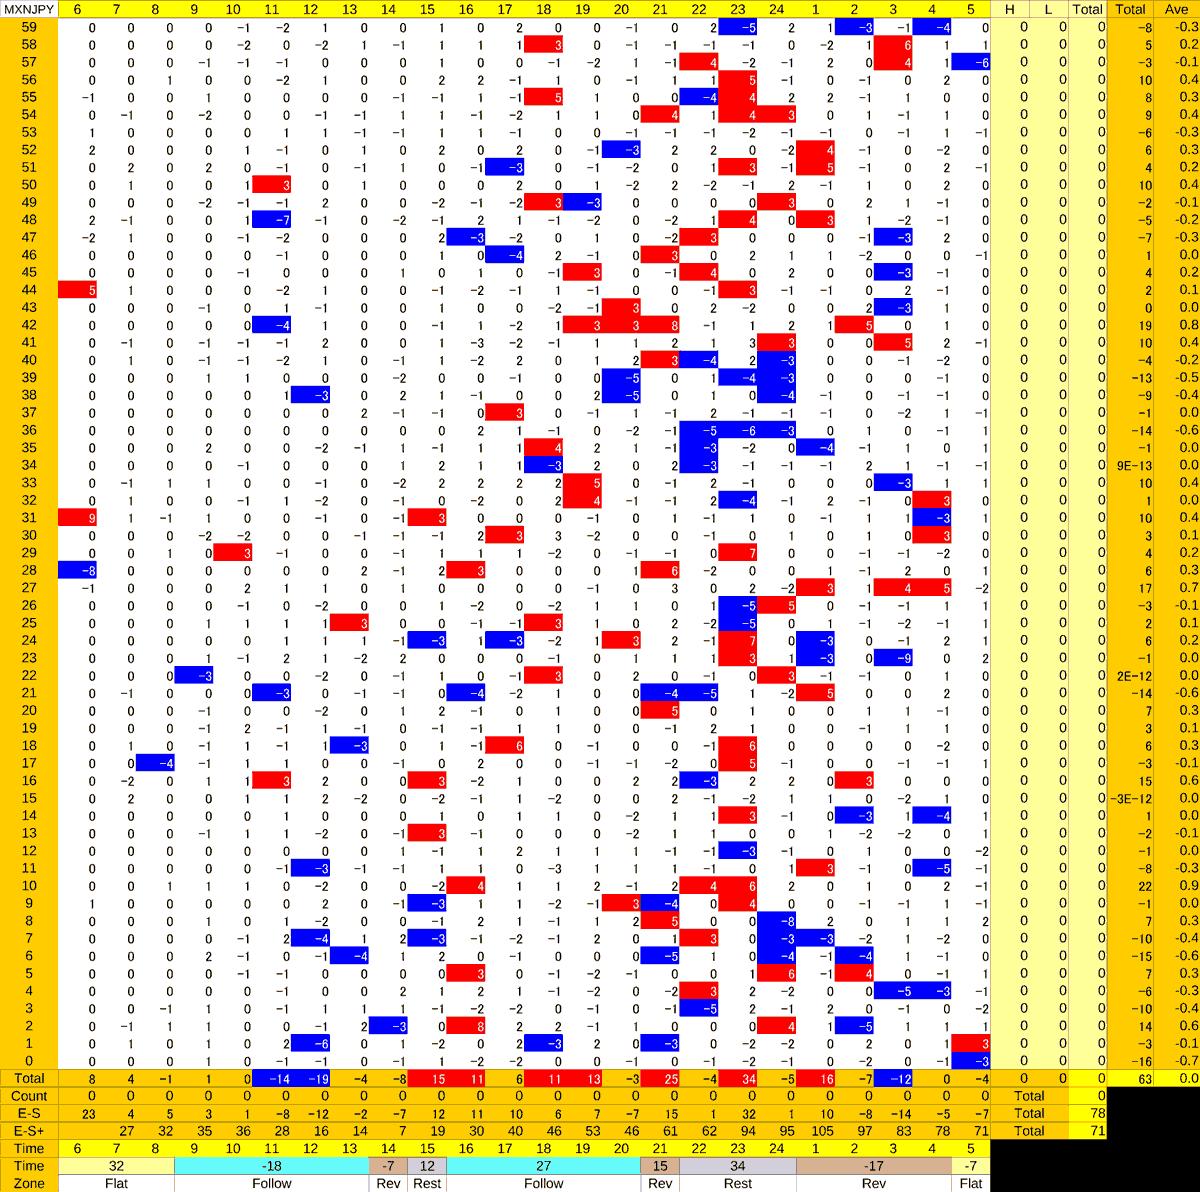 20200930_HS(3)MXNJPY